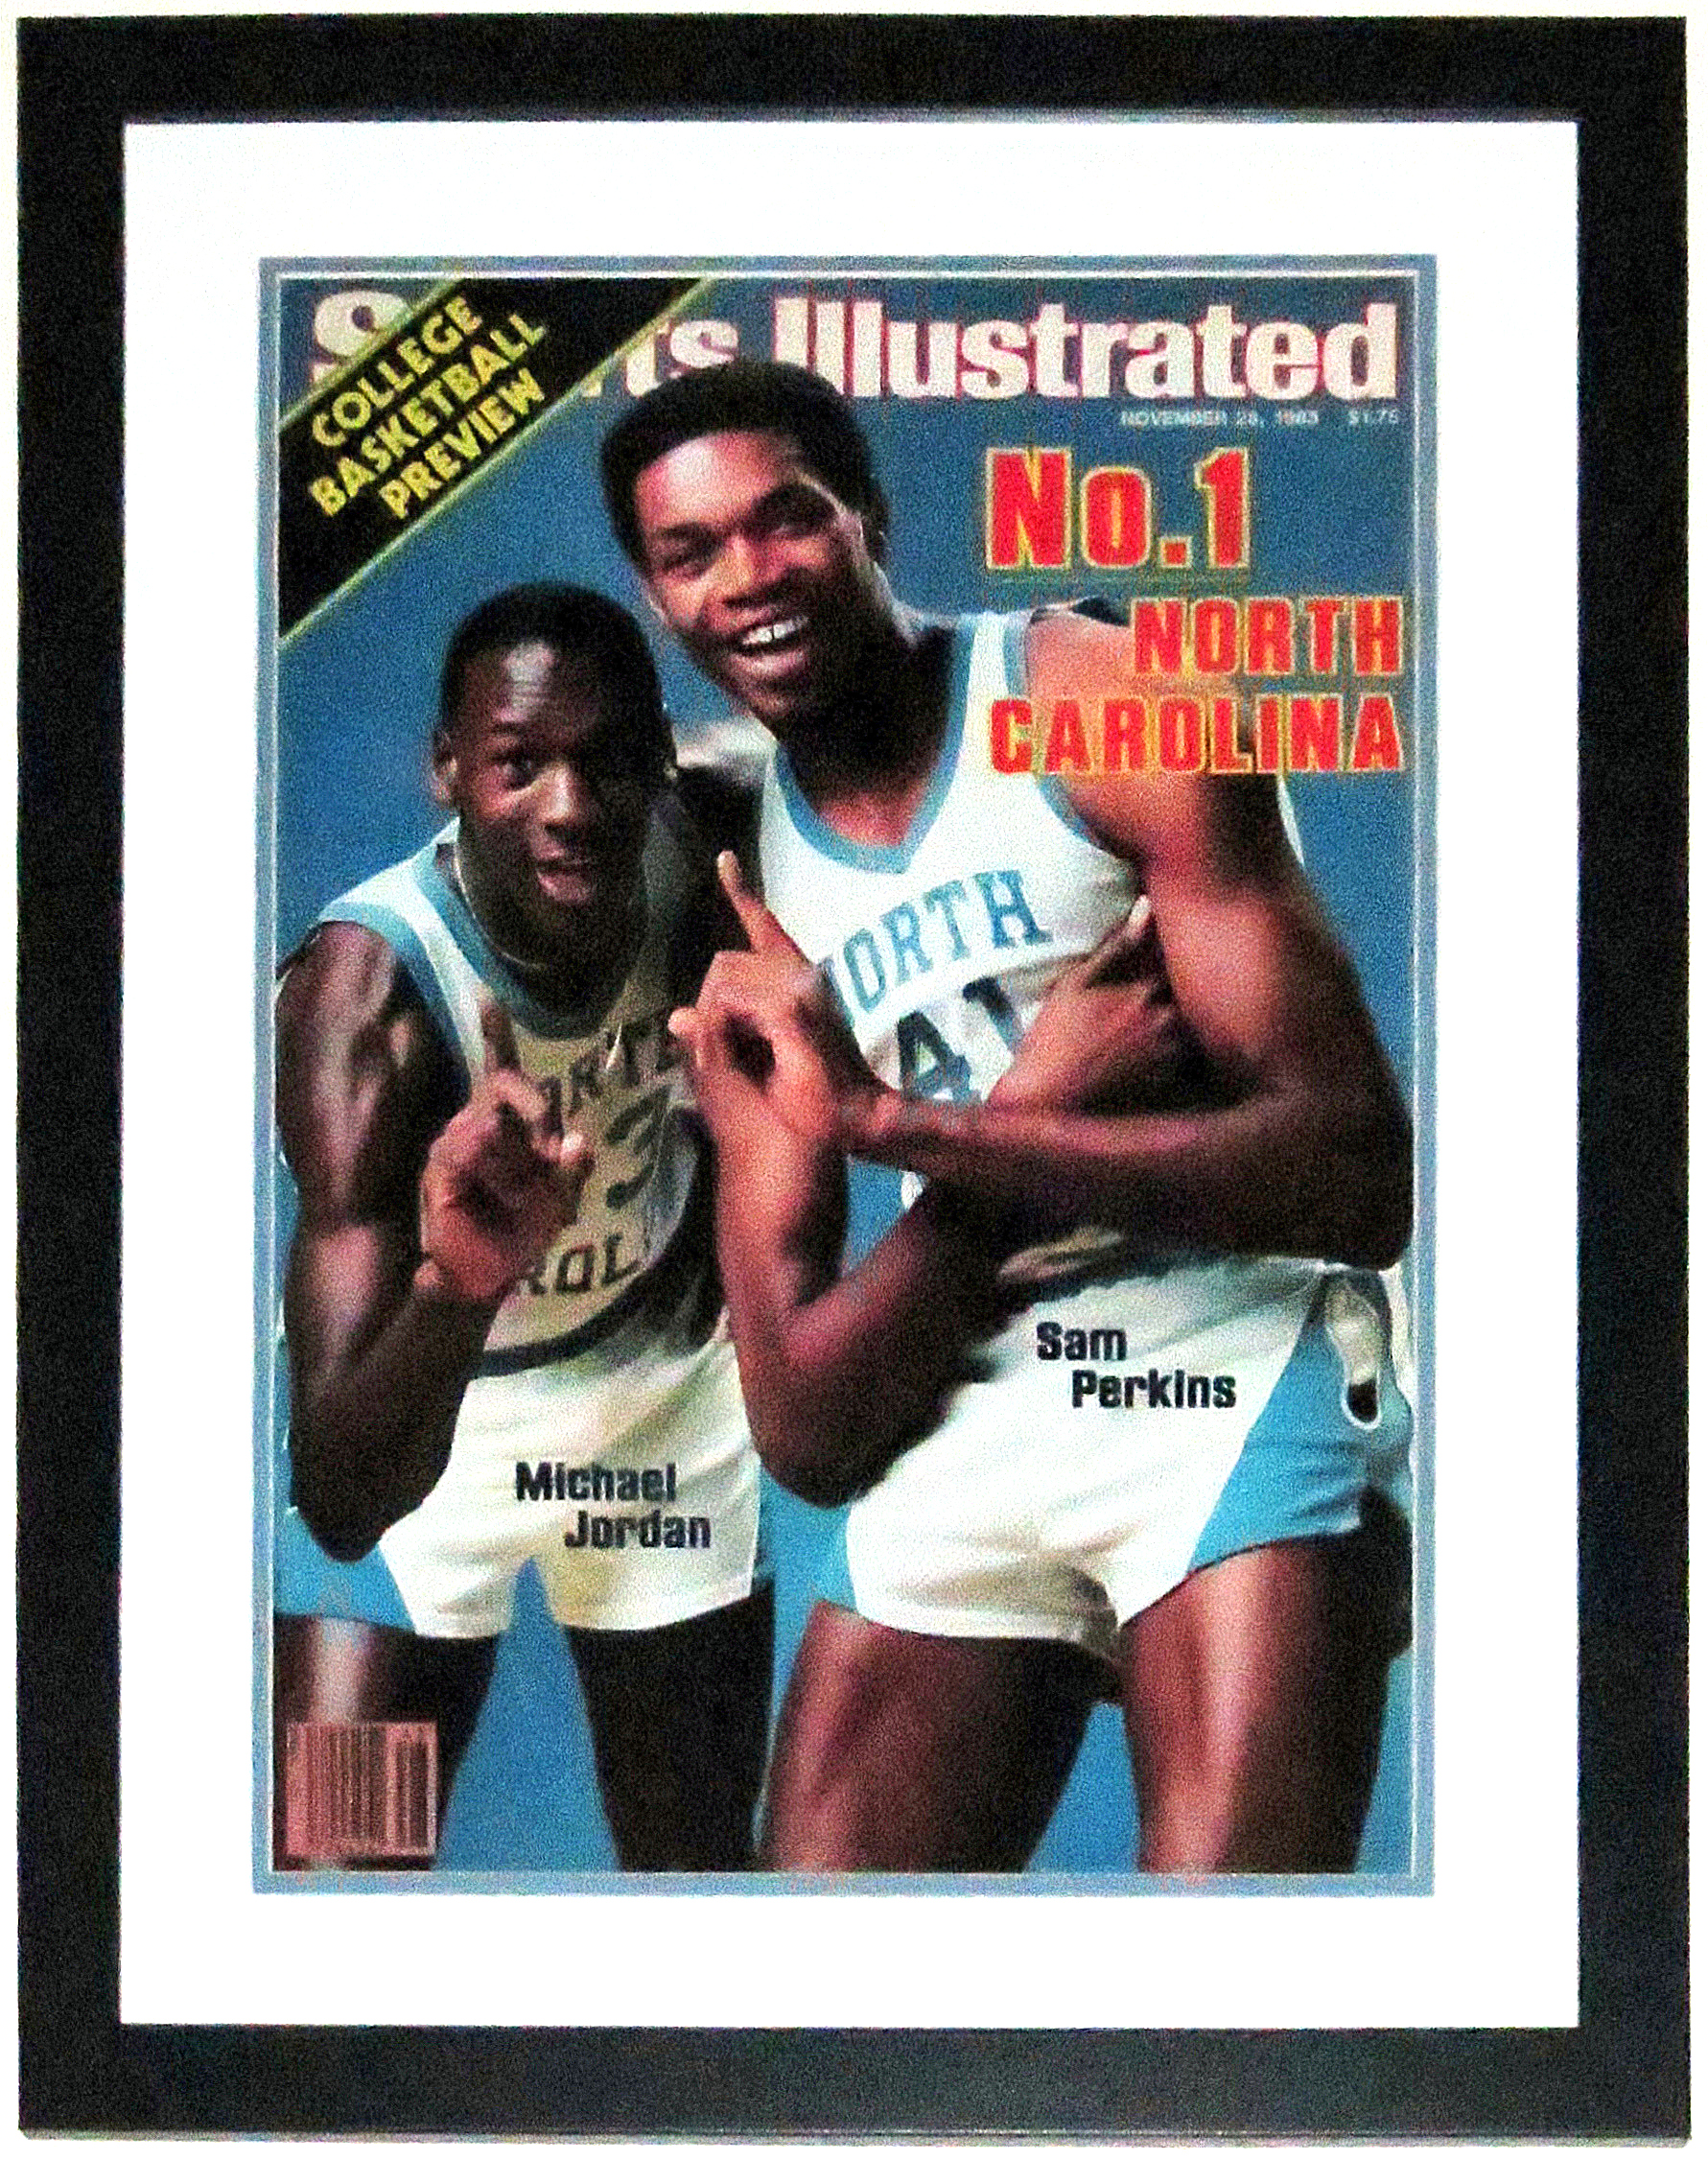 Michael Jordan 1983 North Carolina Tar Heels Sports Illustrated Magazine 16x20 Photo - Professionally Framed